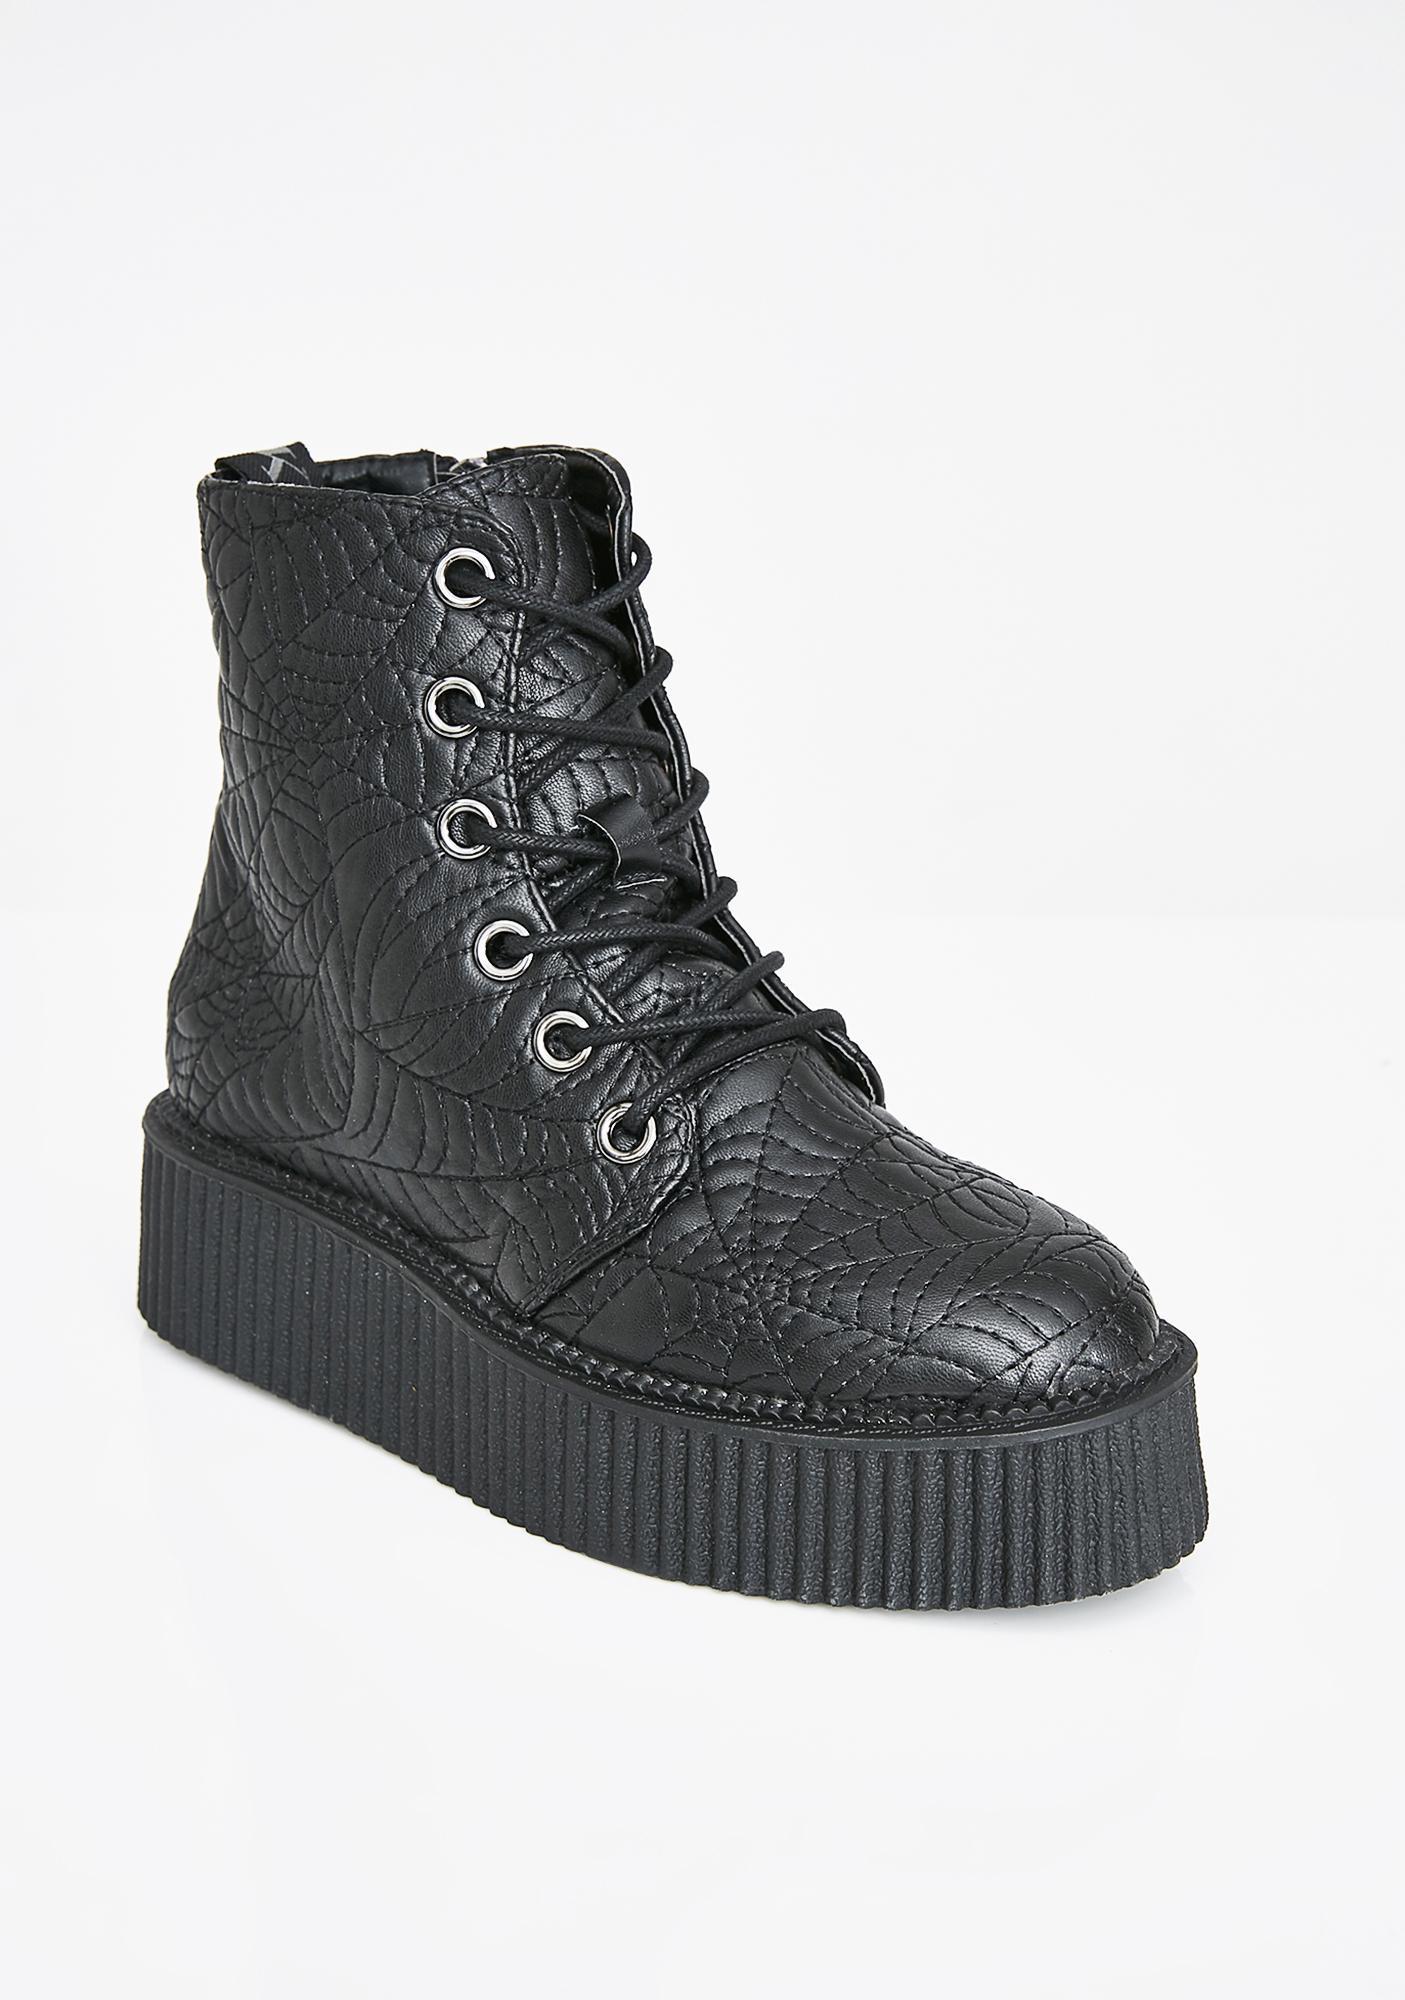 Killstar Coffin Creeper Boots